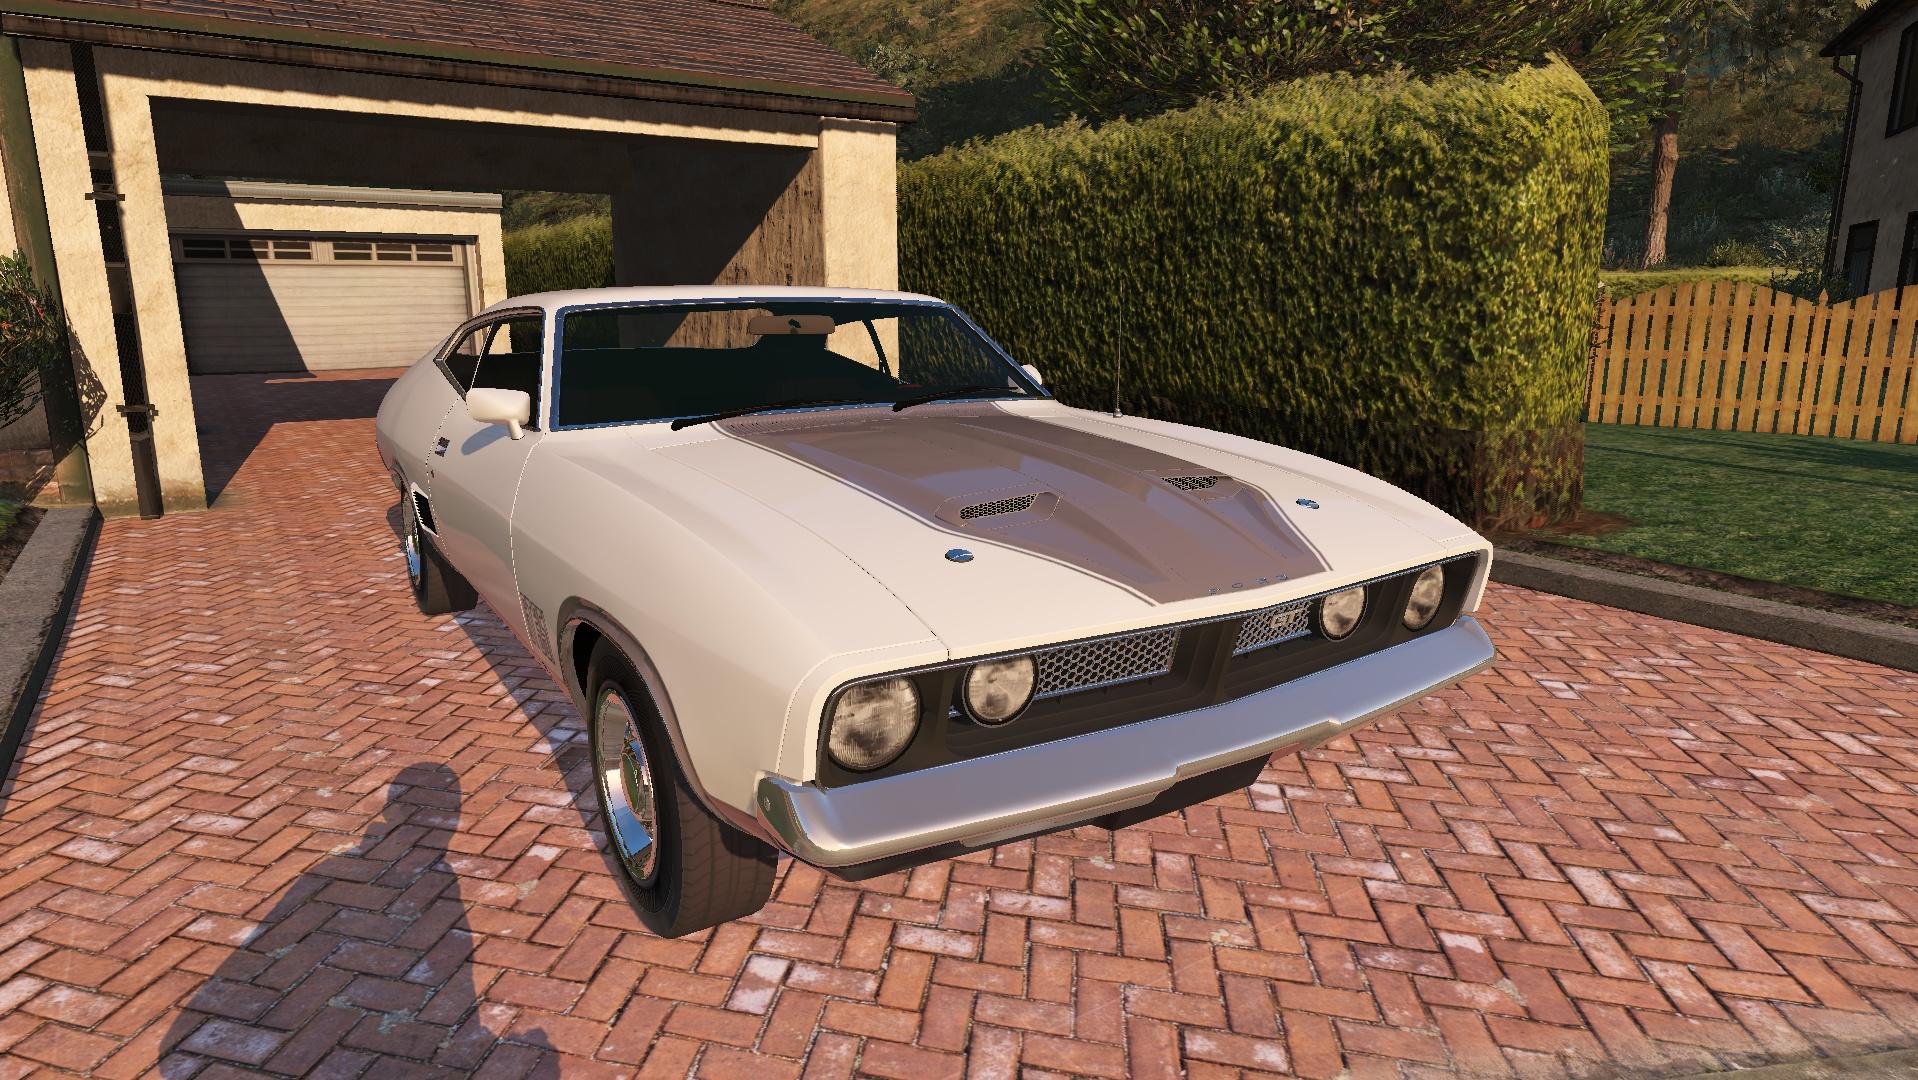 1973 Ford Falcon XB GT 351 [Tuning] GTA5 Mods